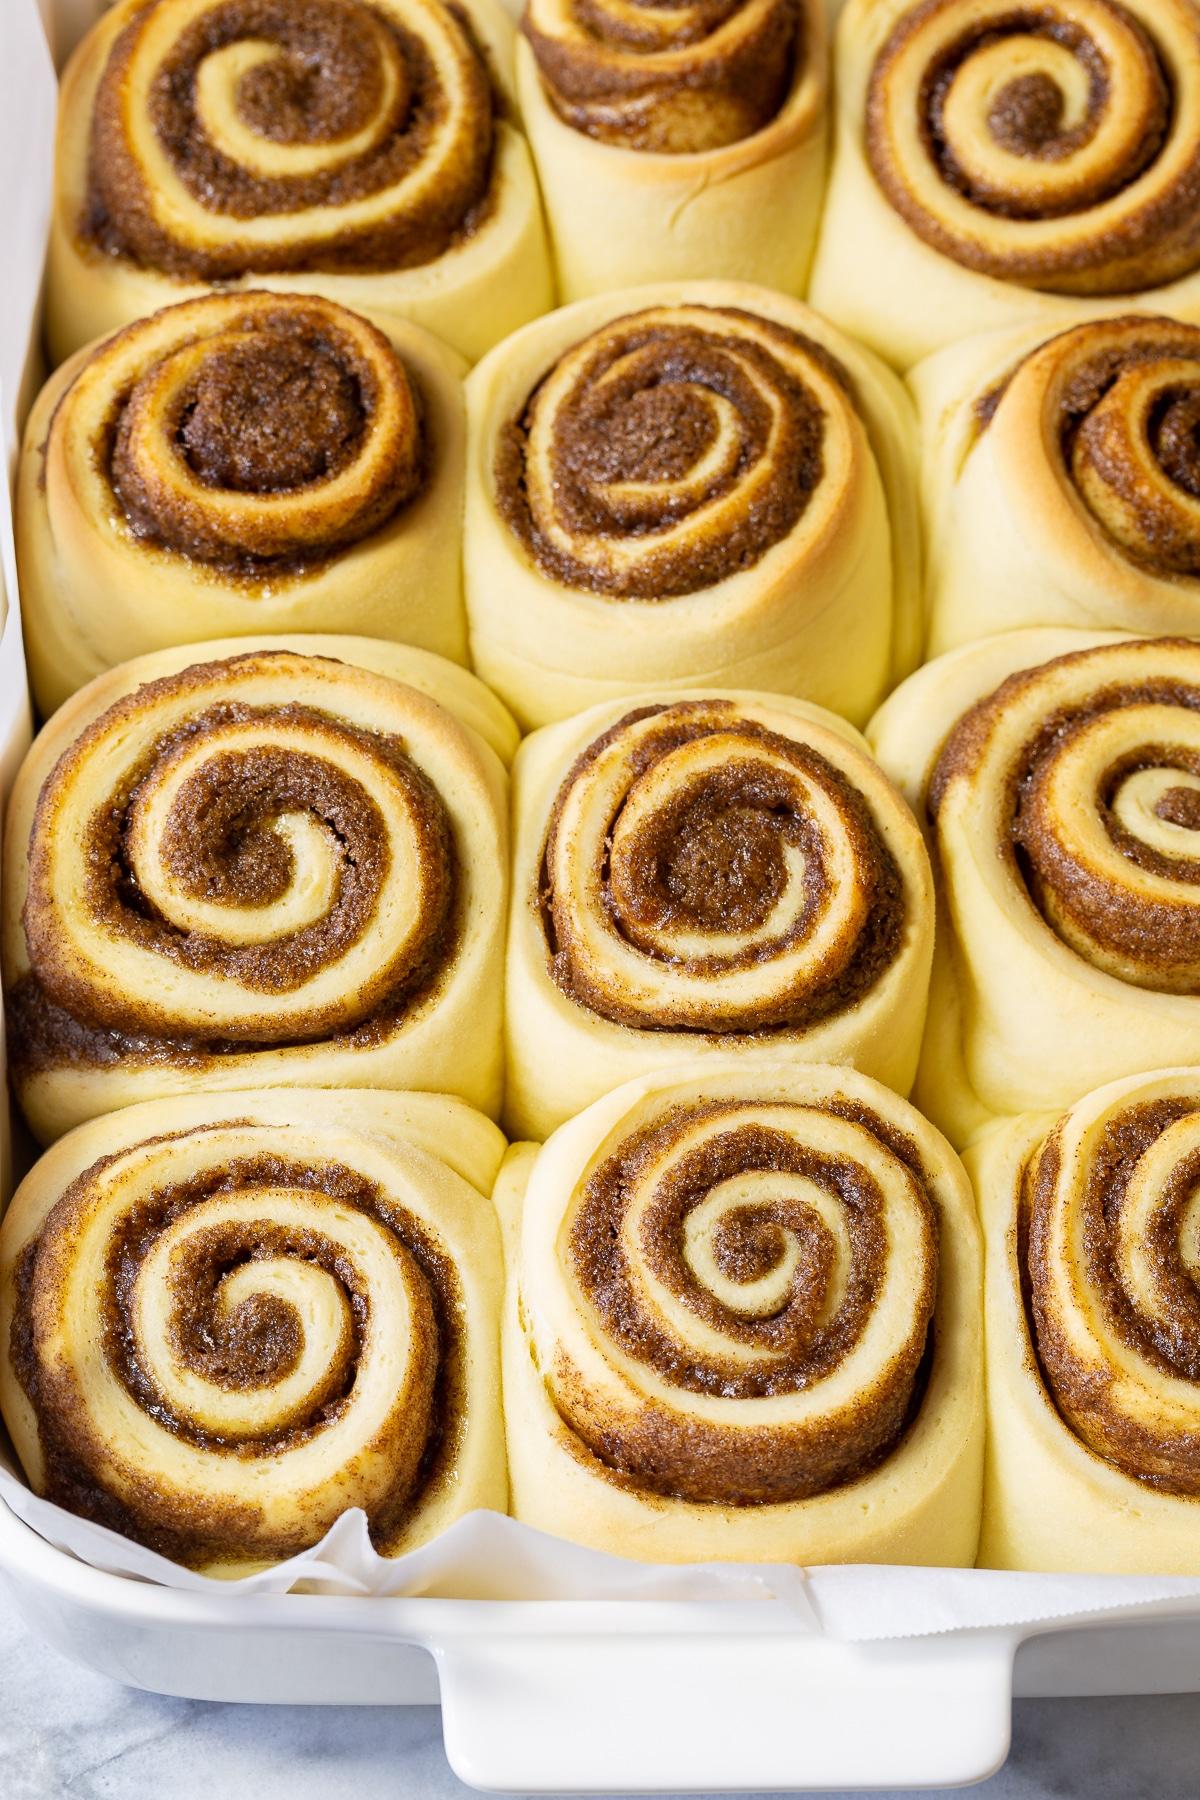 Baked Cinnamon Rolls Recipe #ASpicyPerspective #CinnamonRolls #CinnamonRollRecipe #HowtoMakeCinnamonRolls #Cinnabon #Dessert #Breakfast #Cinnamon #Homemade